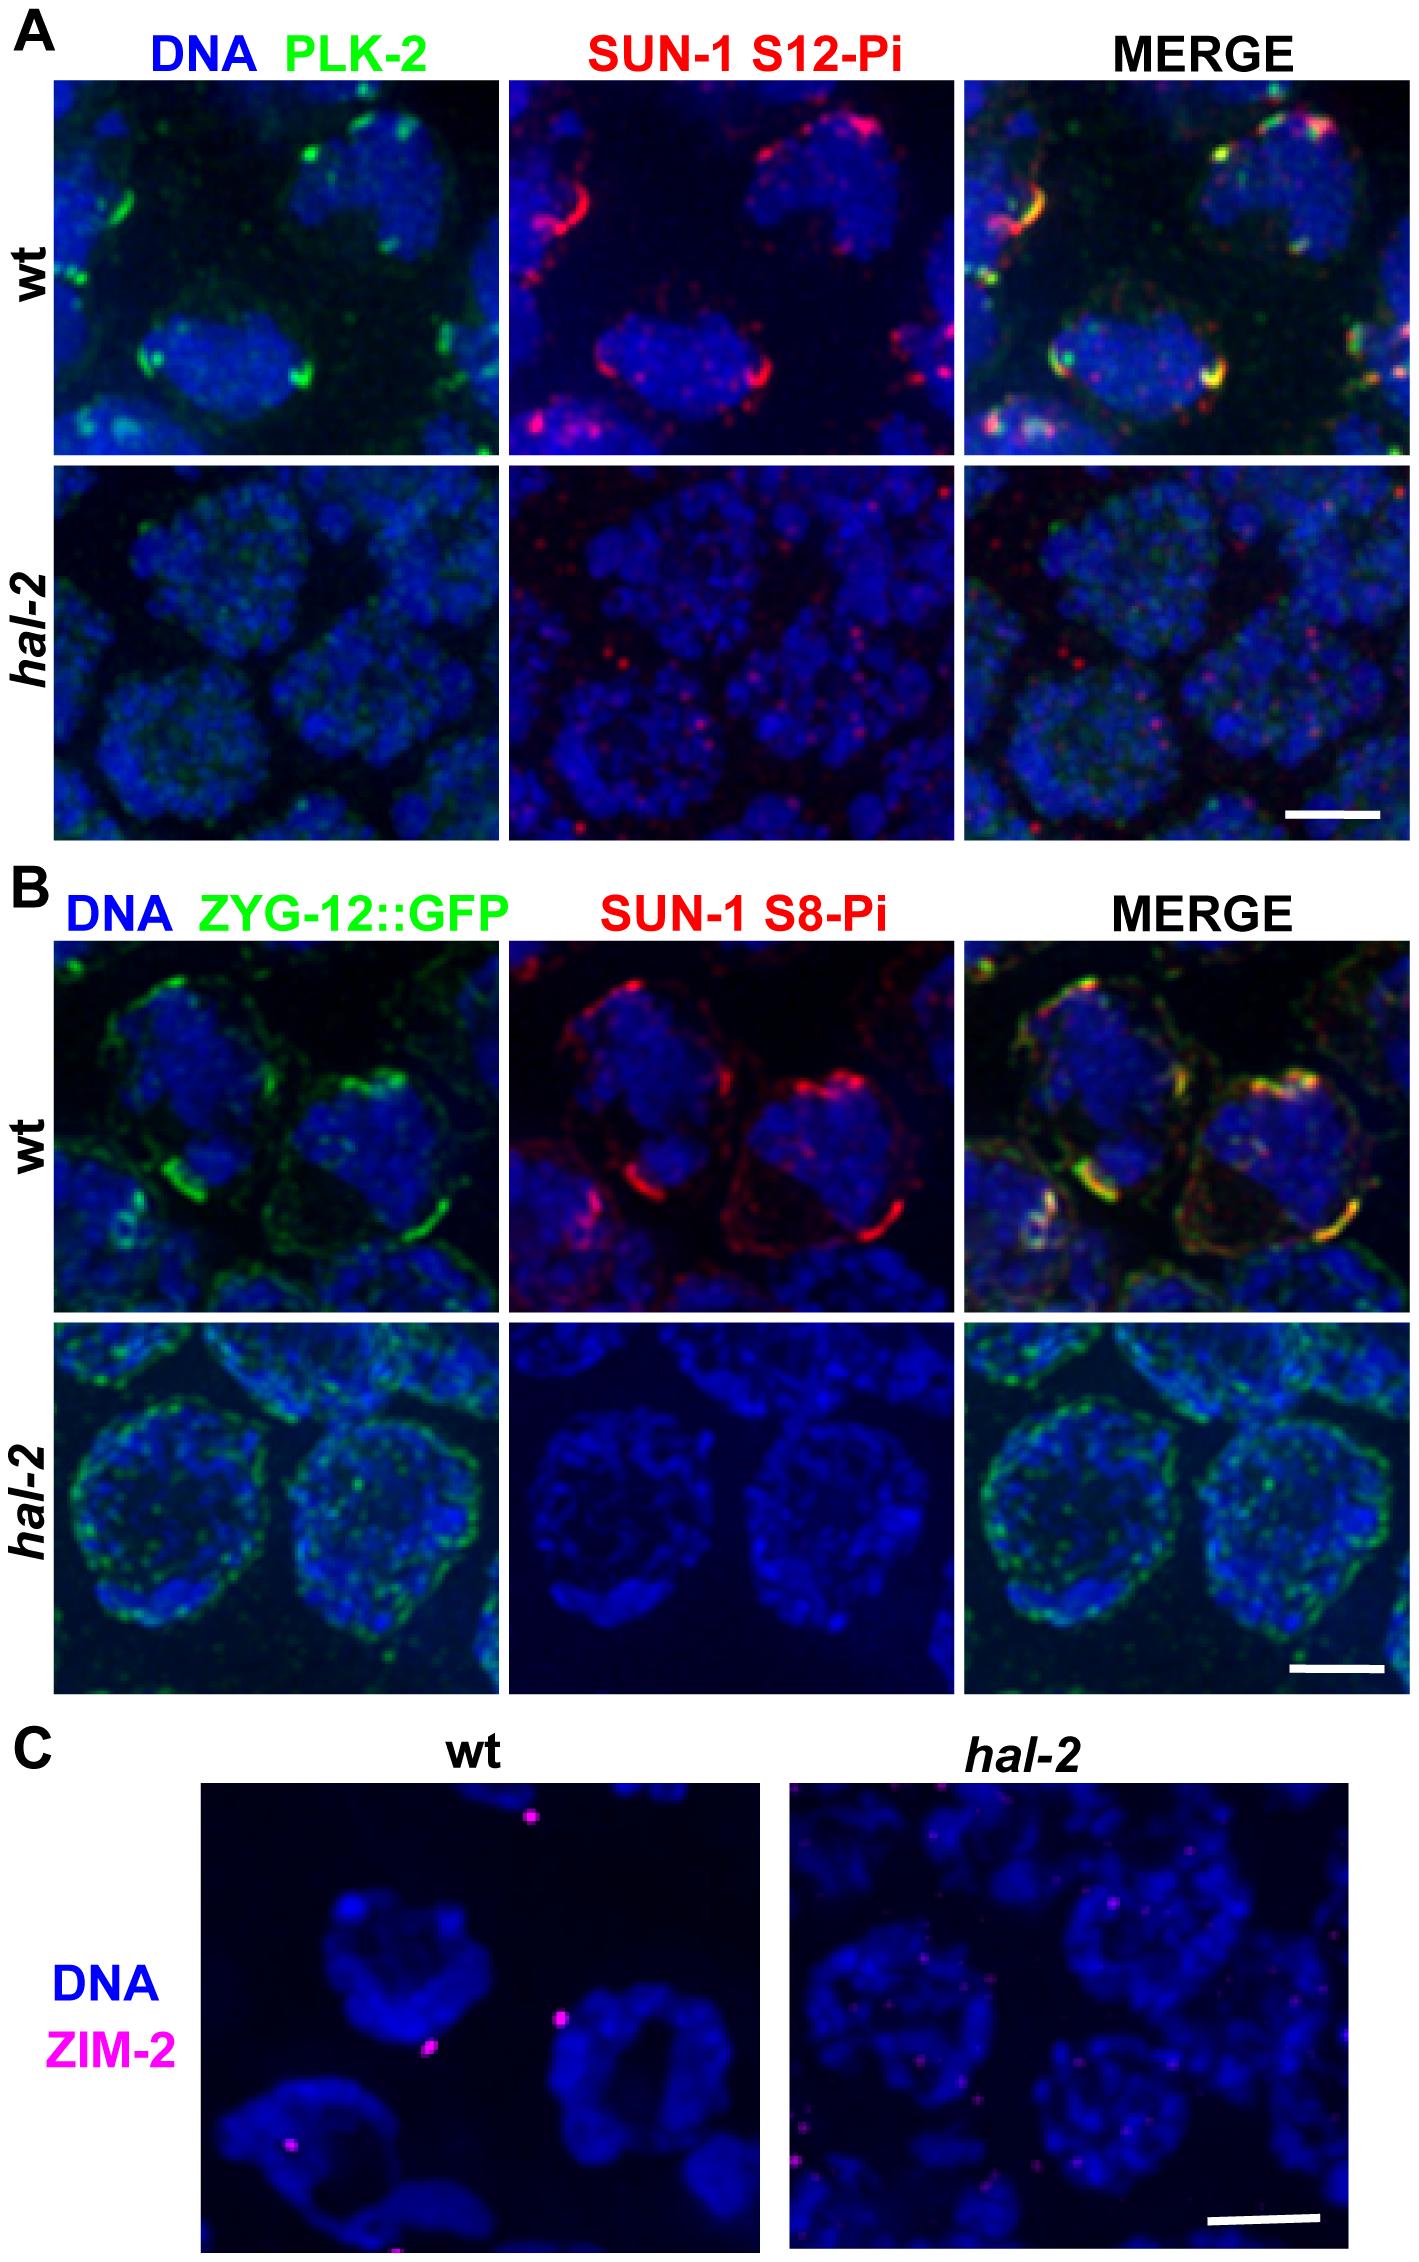 <i>hal-2</i> mutants lack multiple markers of PC-mediated chromosomal movement.